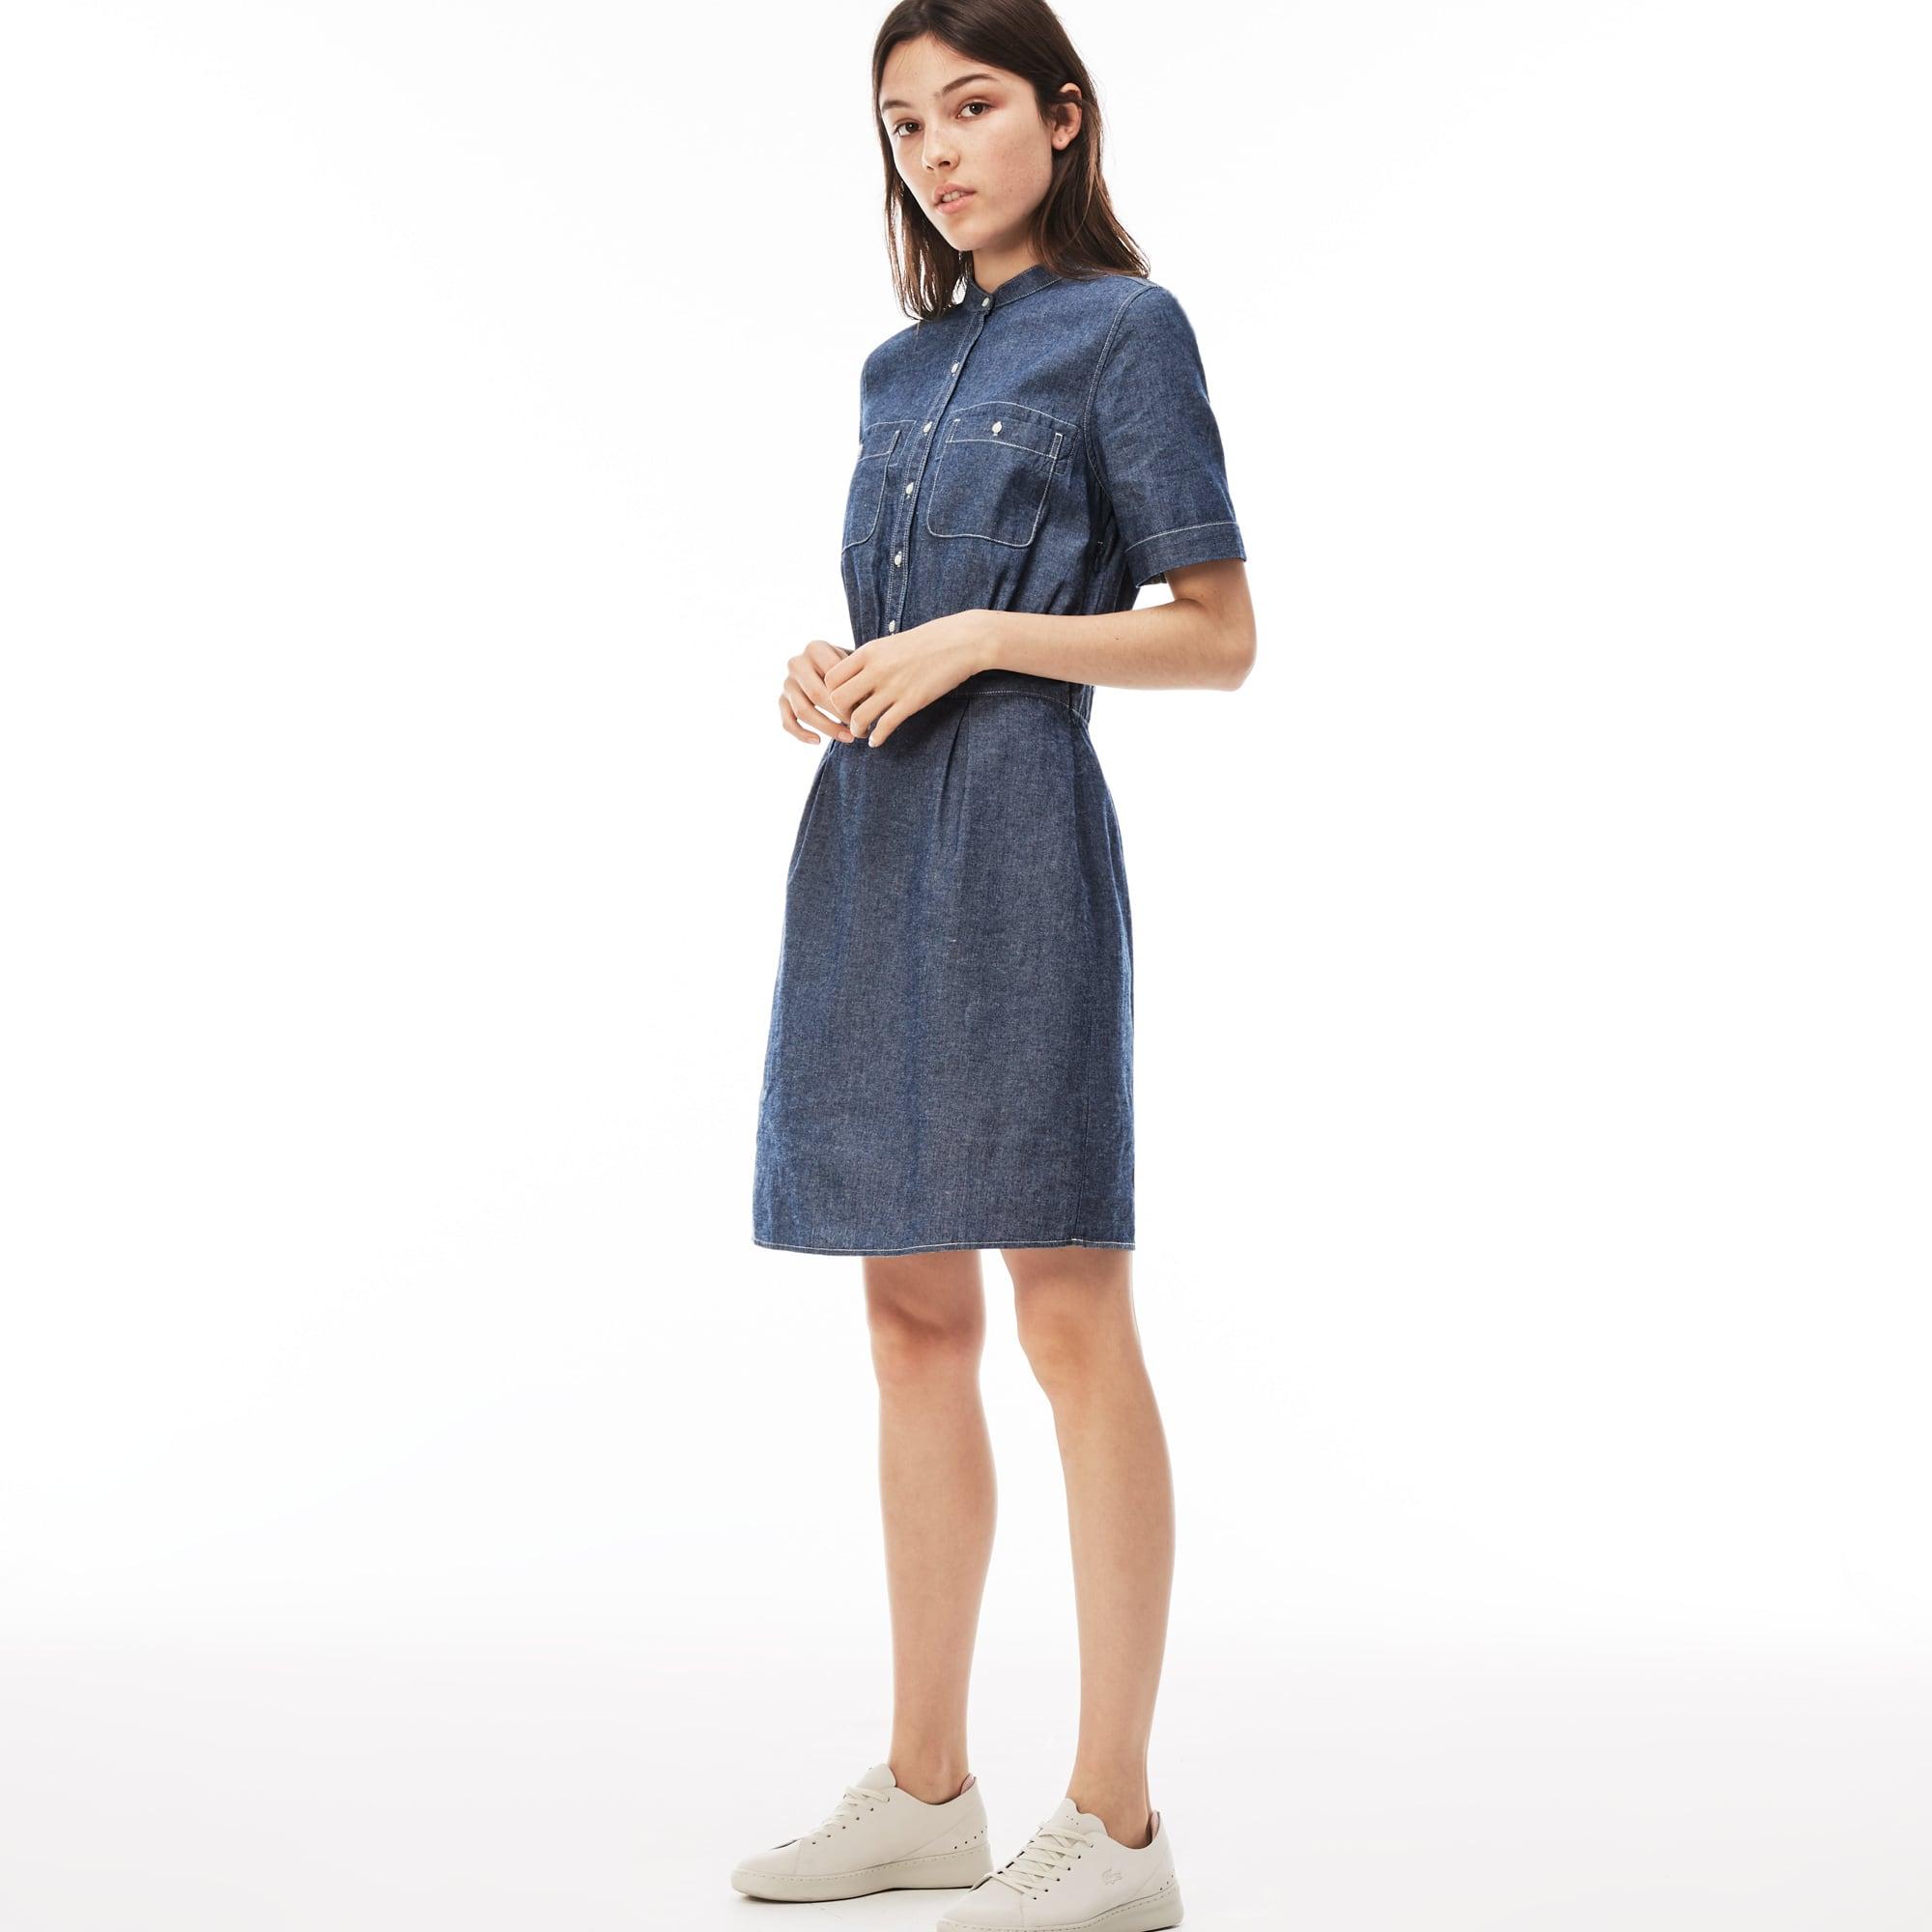 Lacoste LIVE-jurk katoenchambray met maokraag